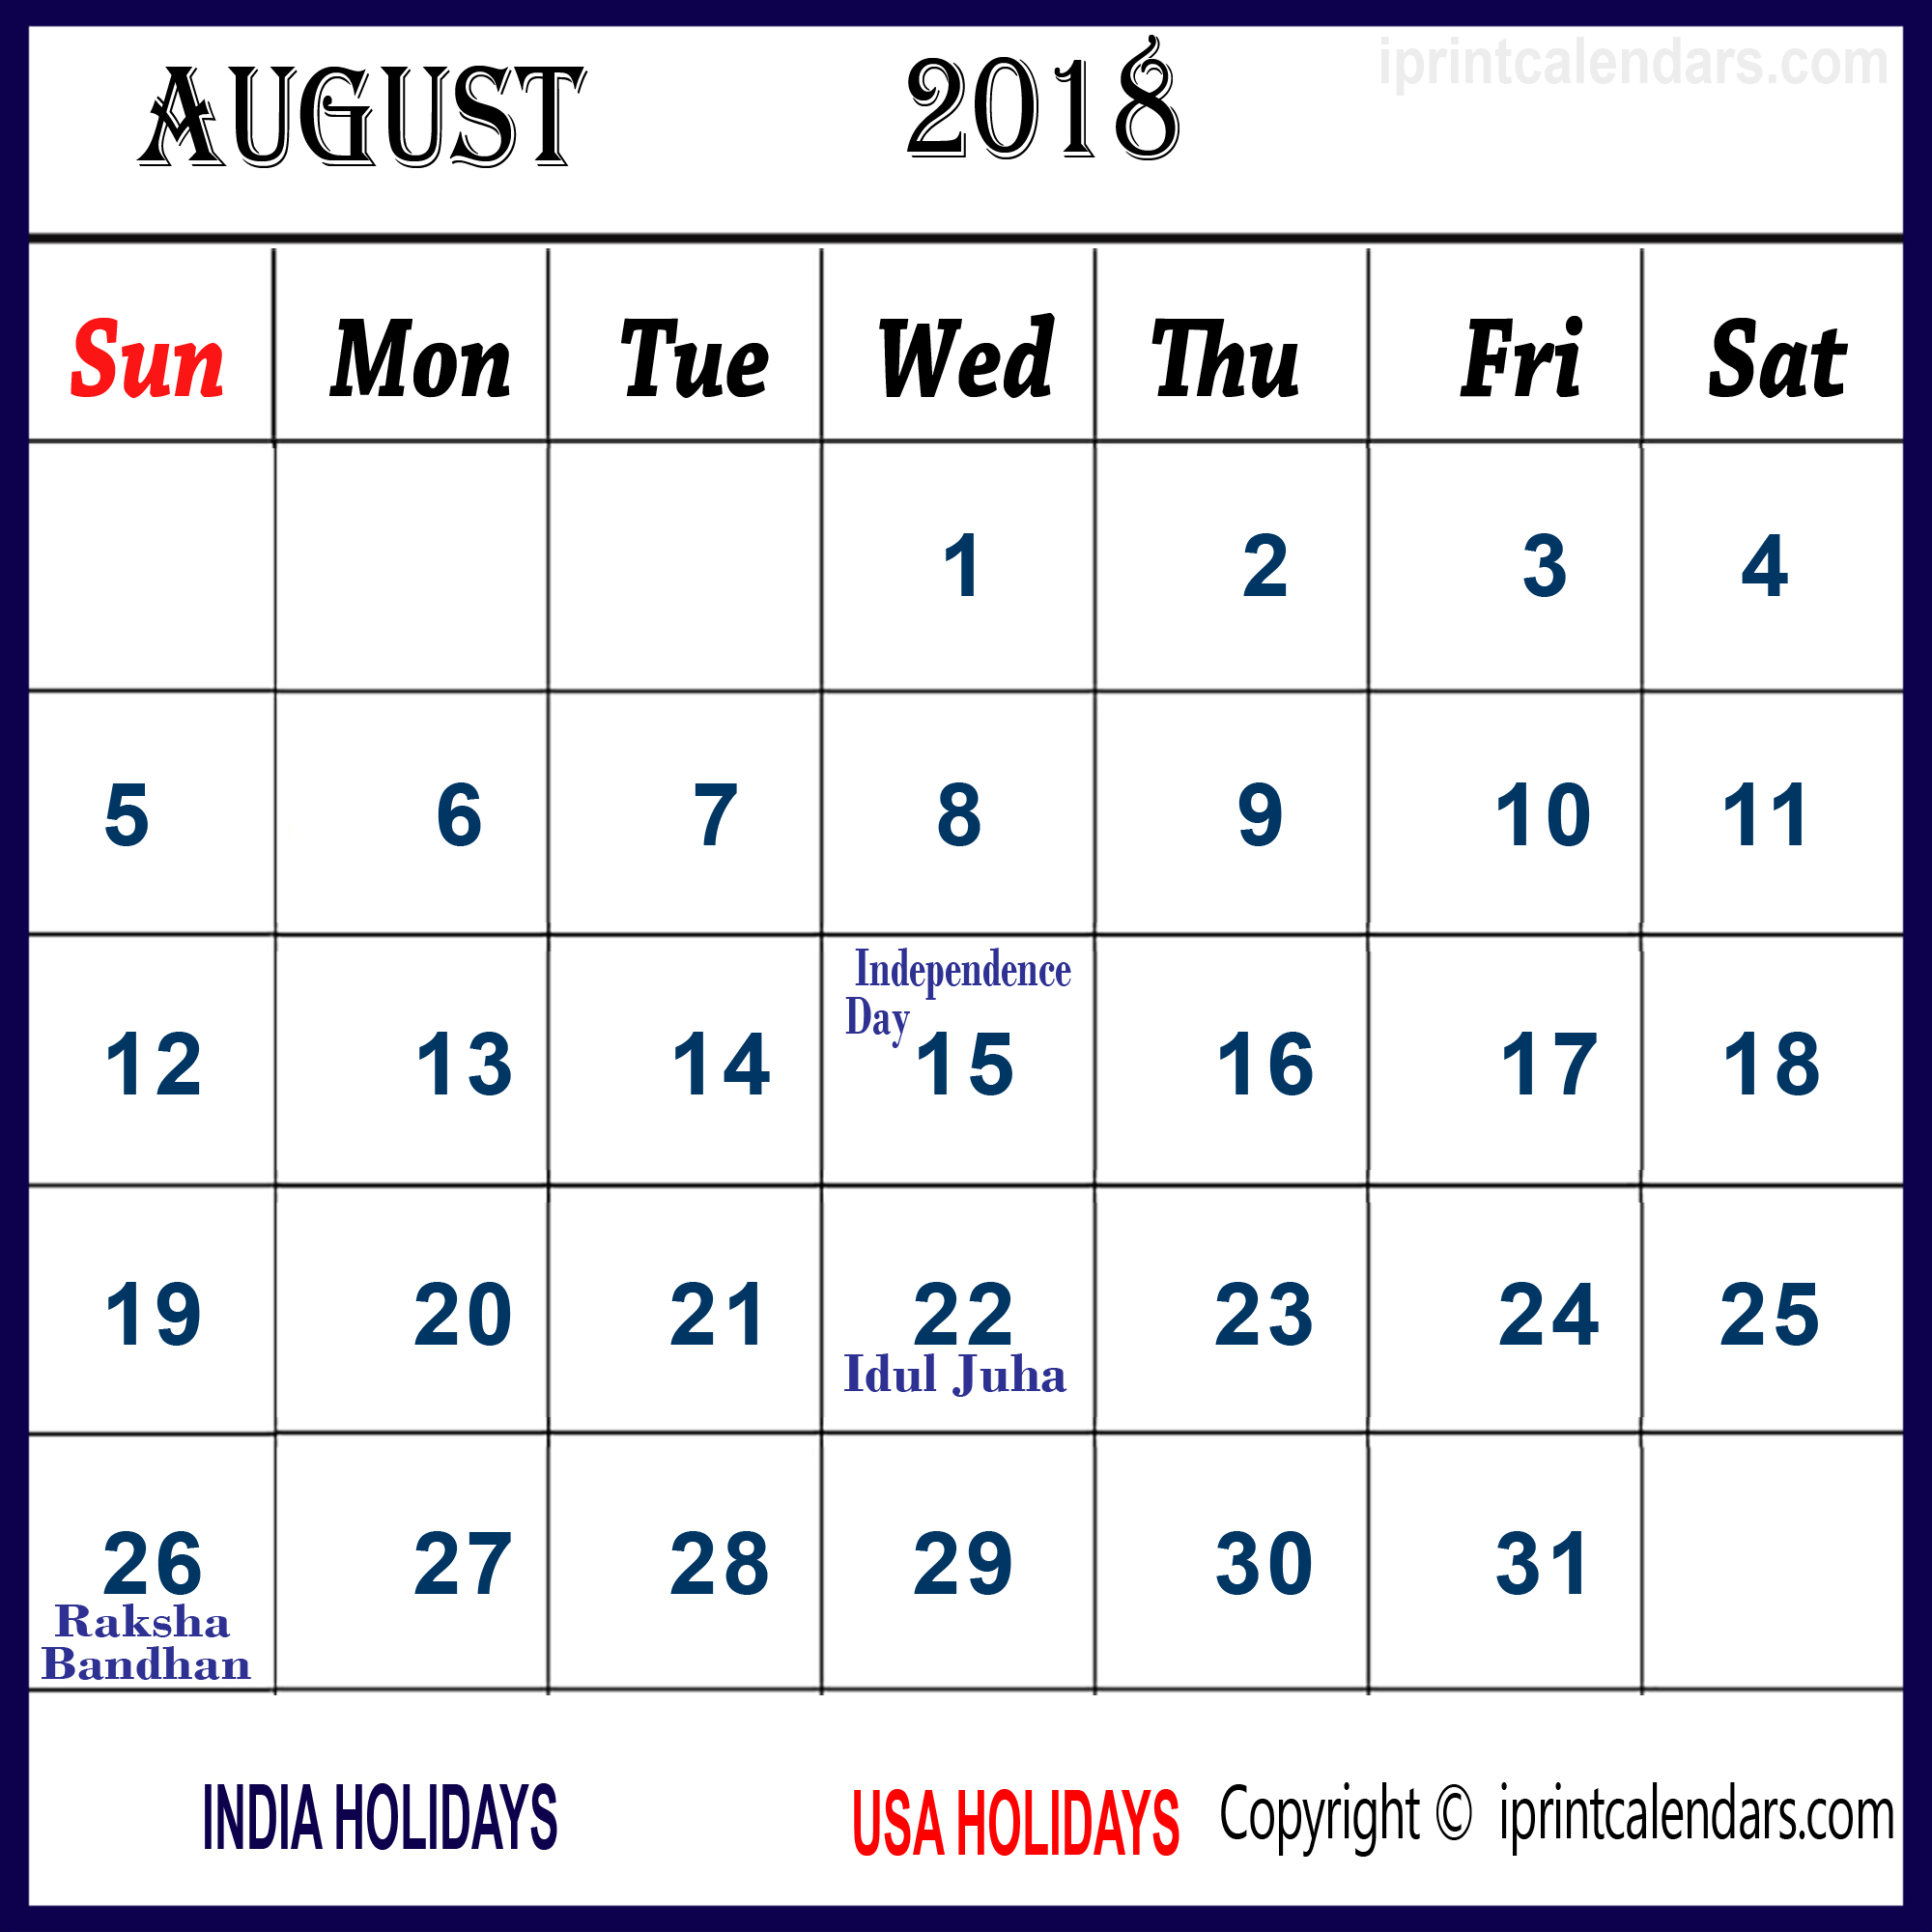 August Calendar 2018 India